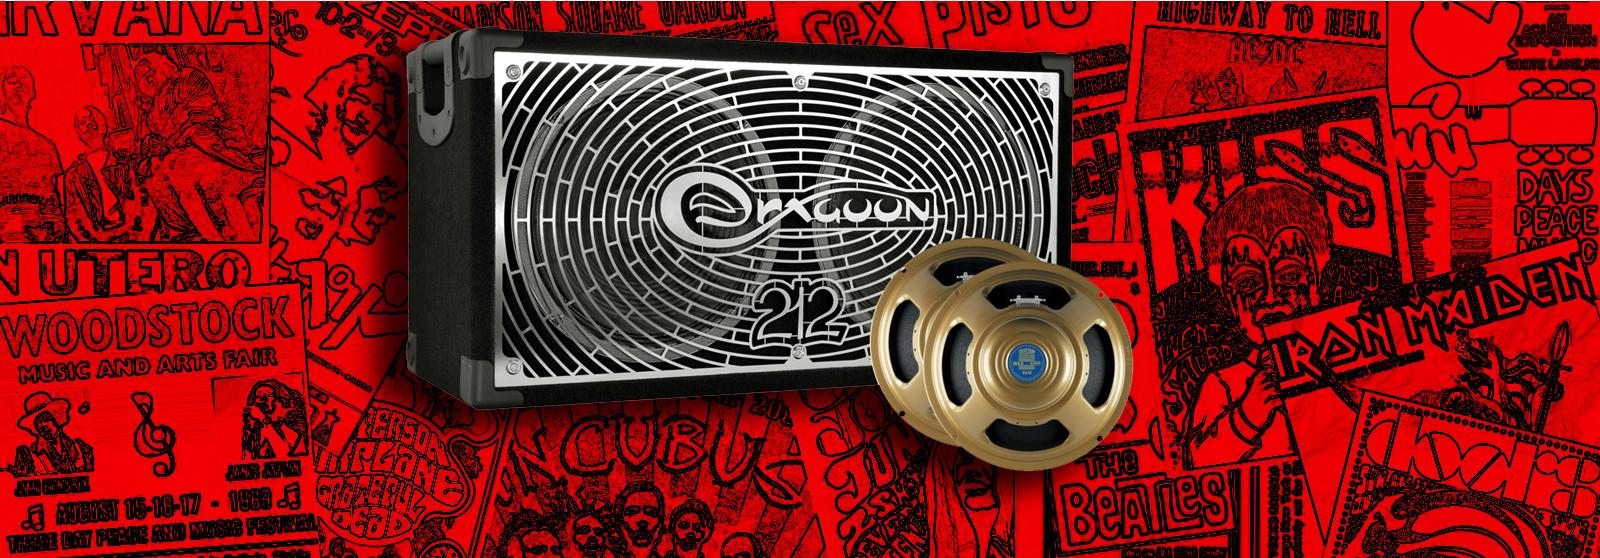 Dragoon - The Custom Speaker - DRAGOON-250C8G_20160628191049325285.jpg